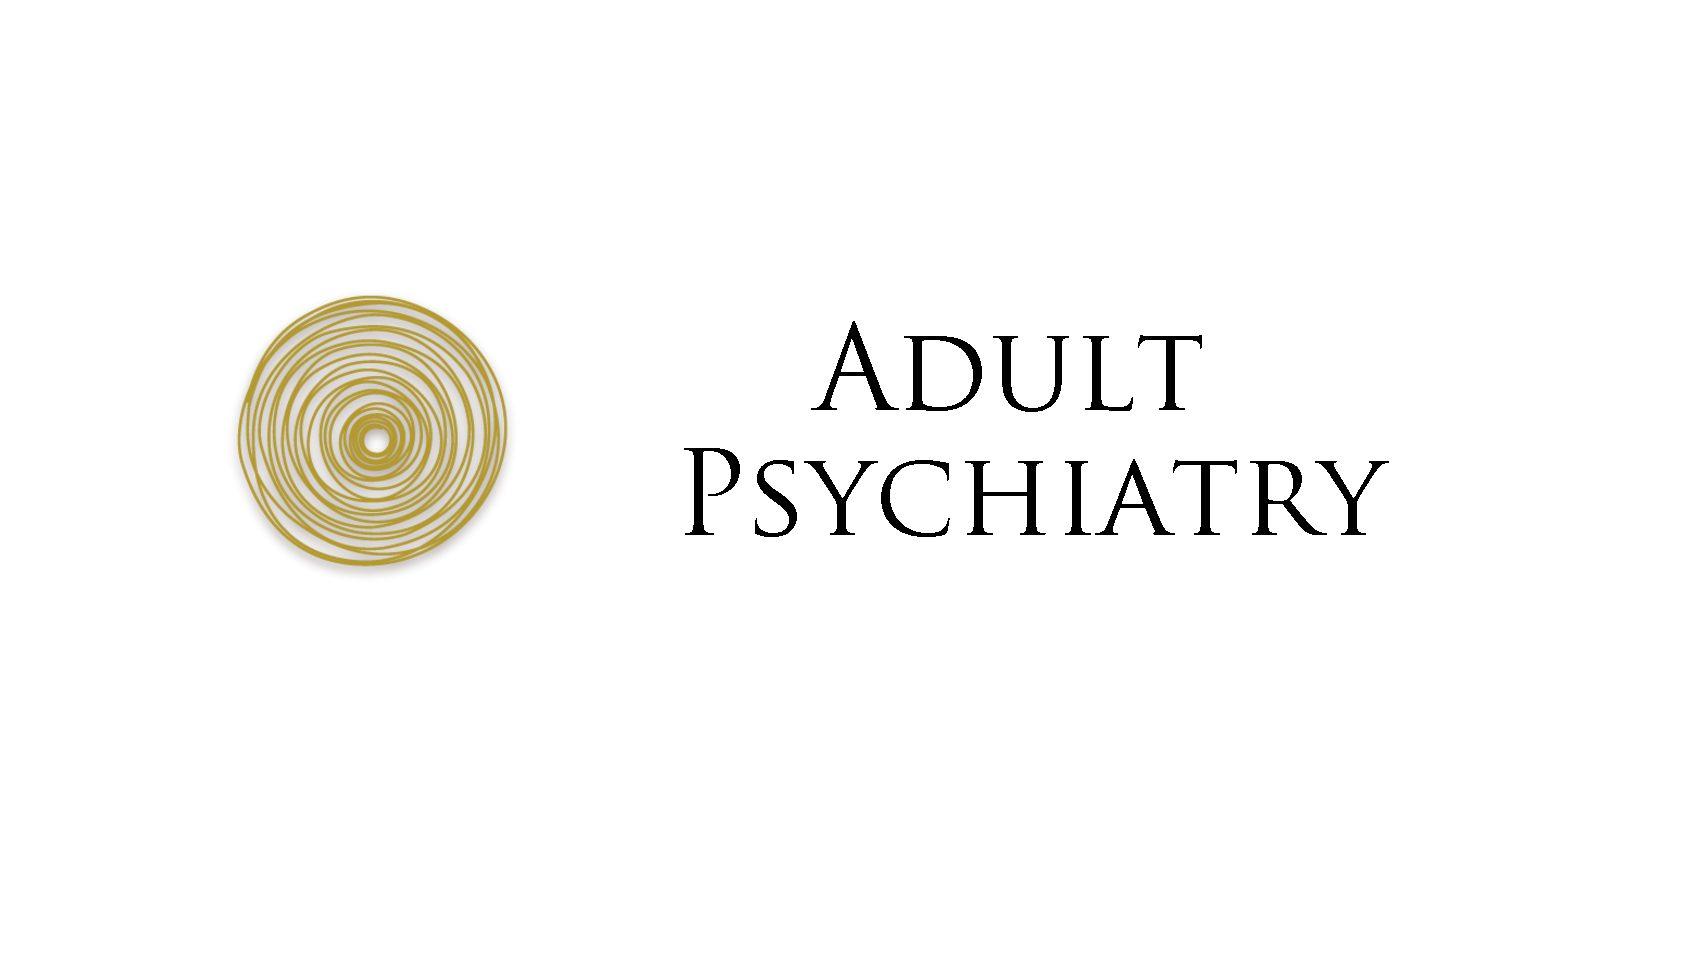 Adult Psychiatry